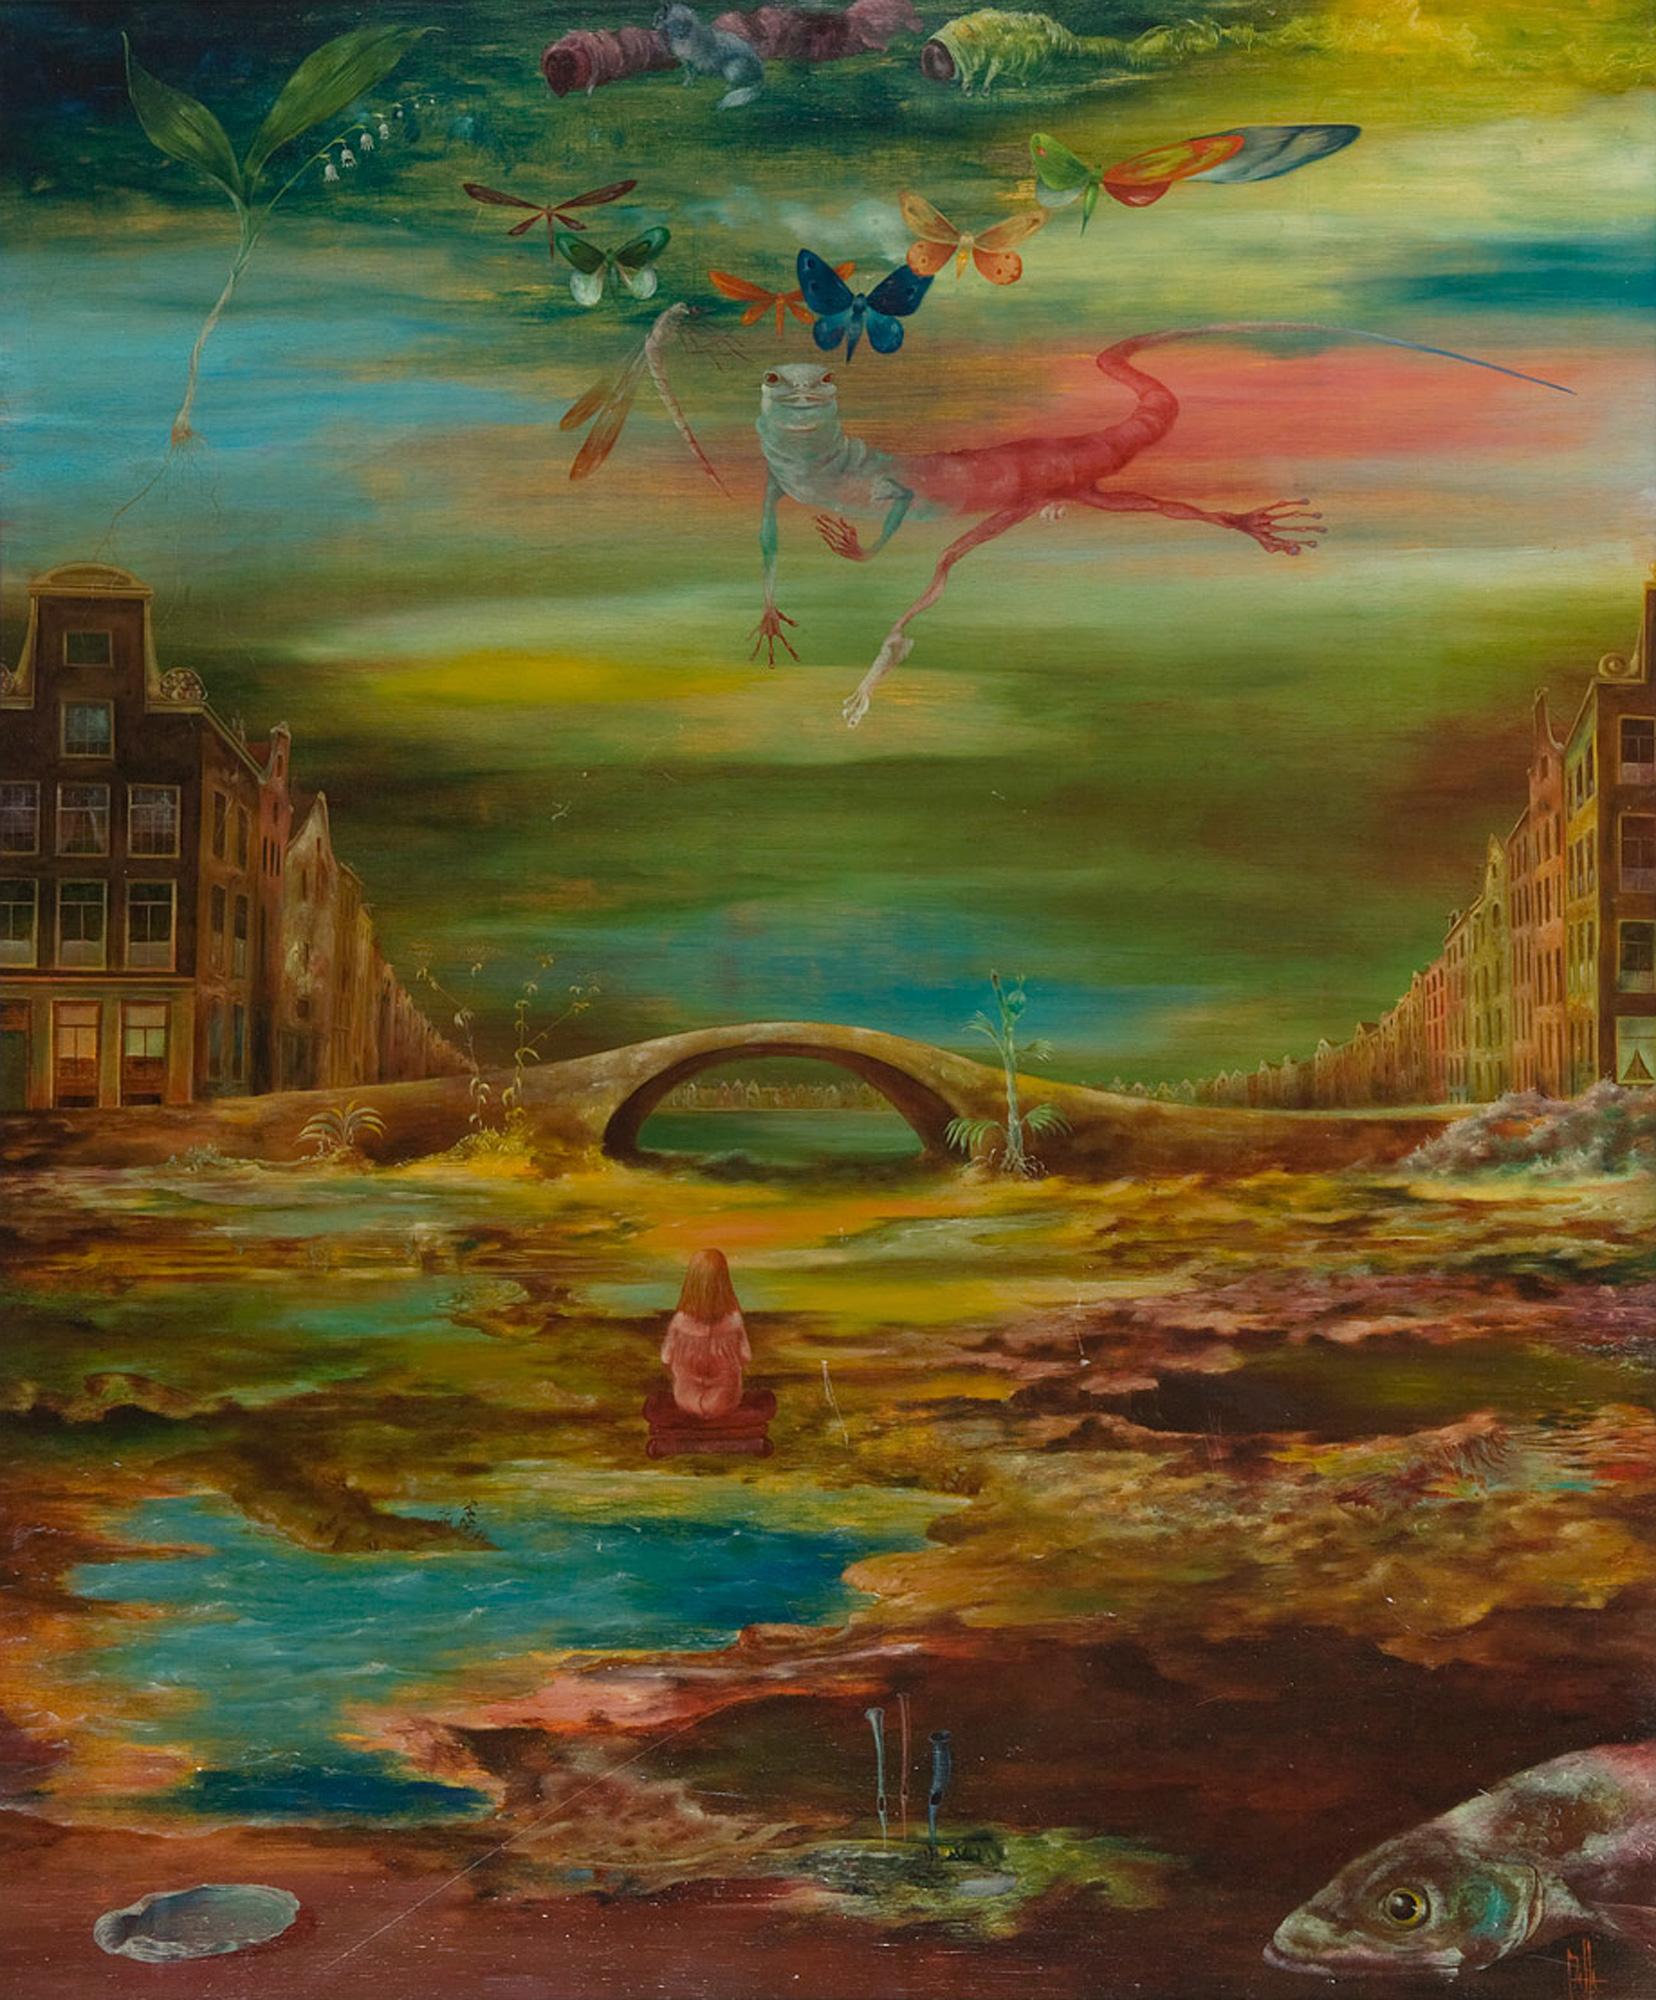 Melle schilder   Amsterdam, olieverf op paneel